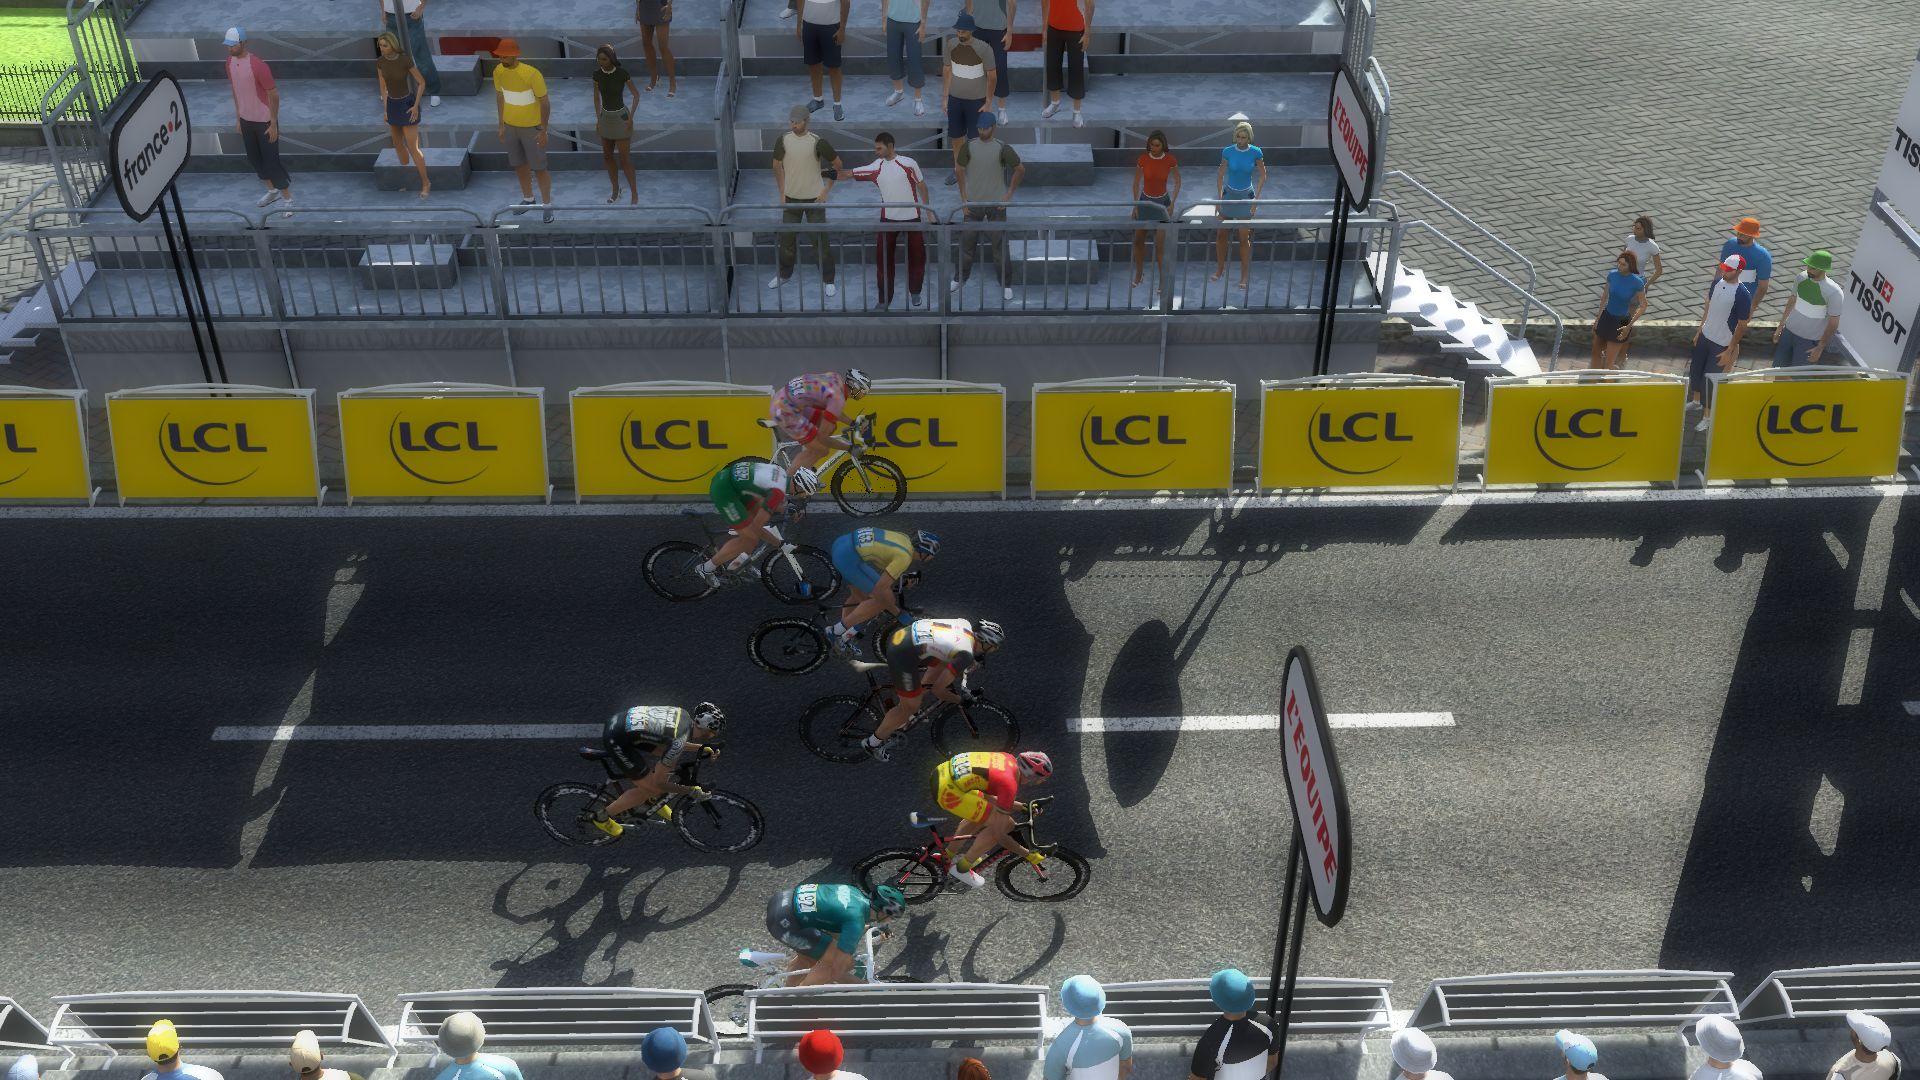 pcmdaily.com/images/mg/2019/Races/PTHC/East%20Java/JavaS1%2013.jpg